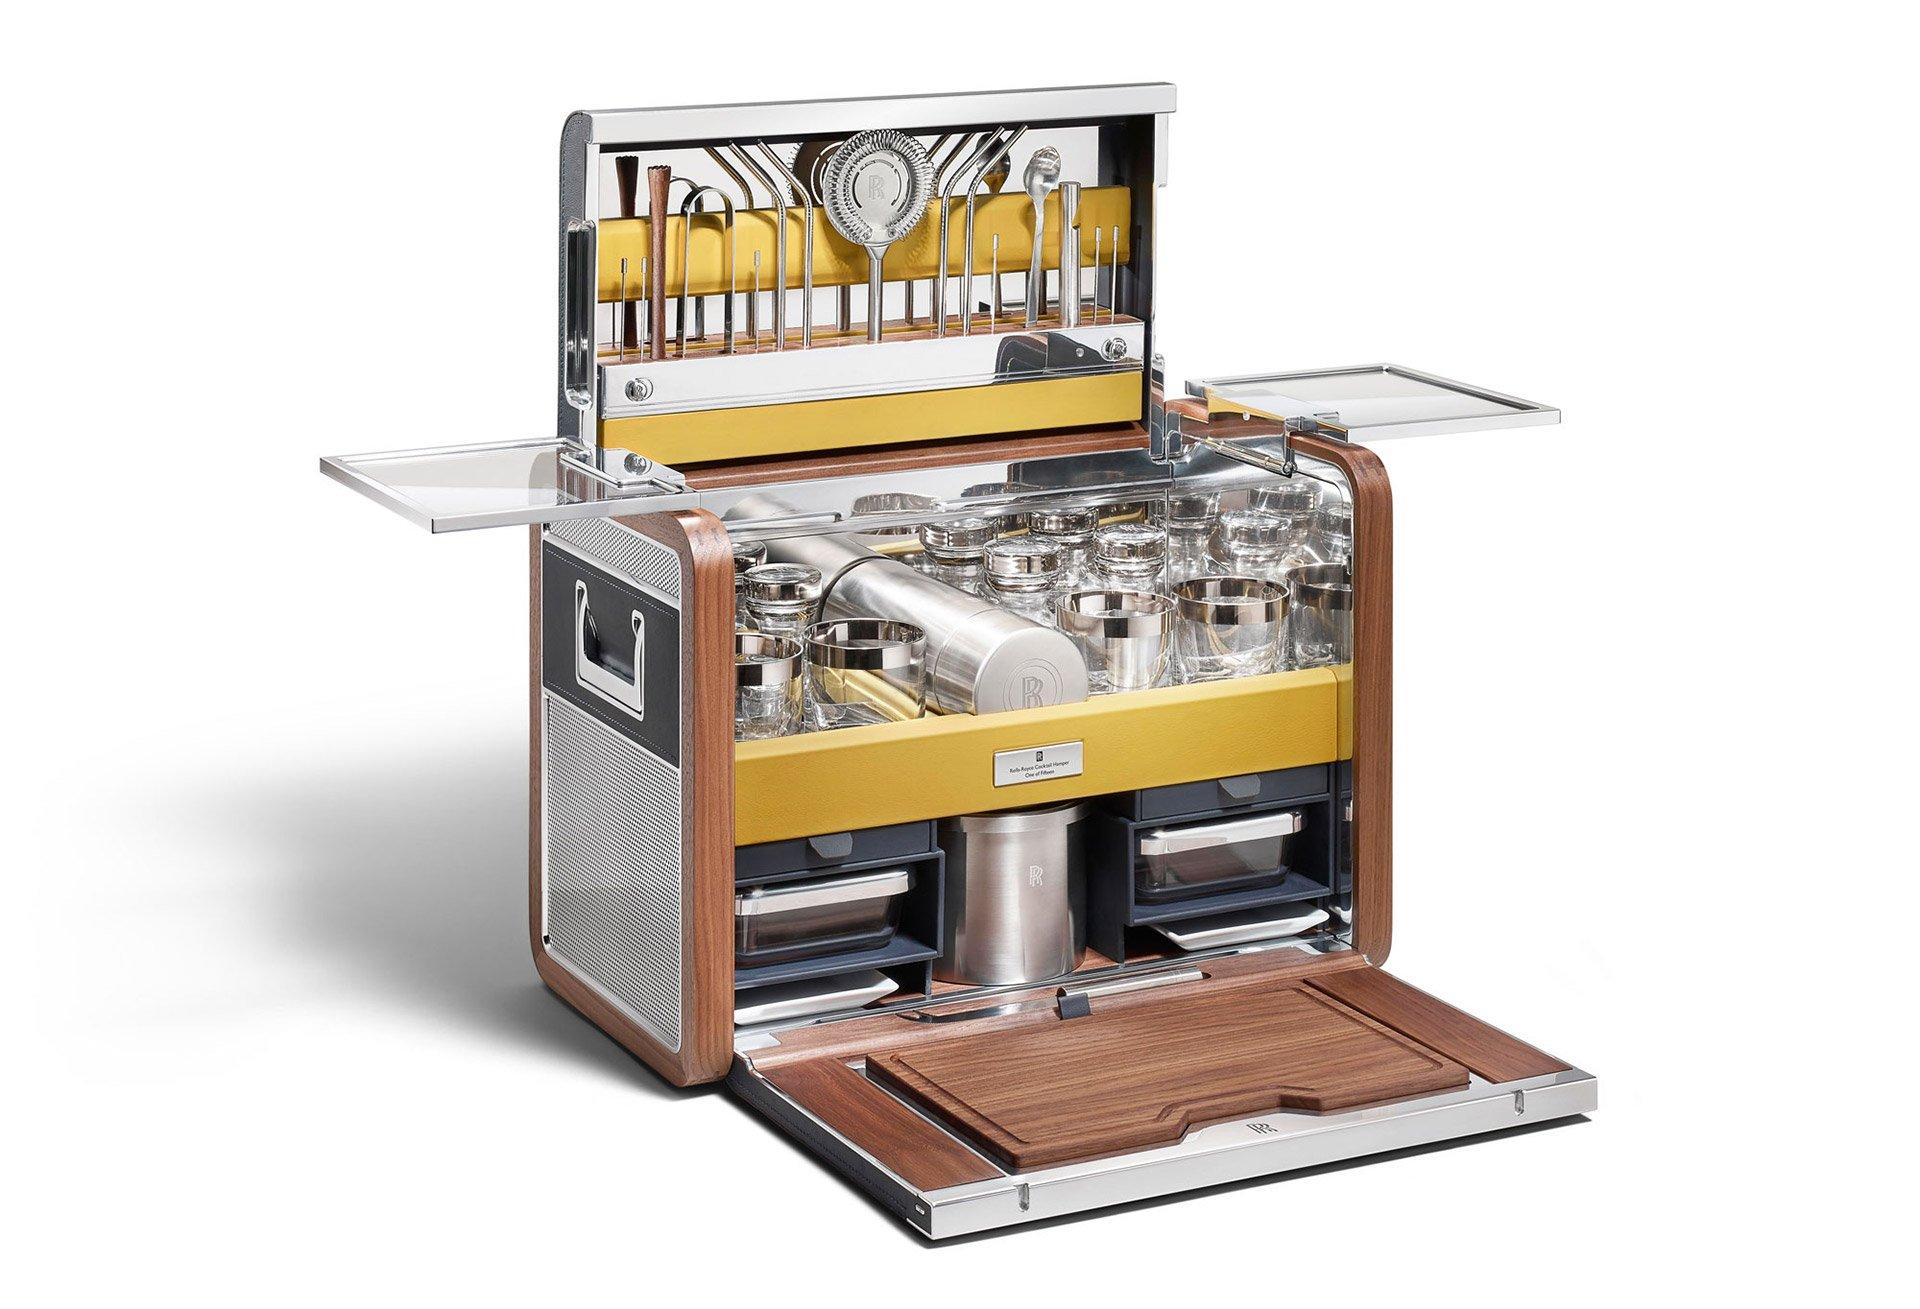 Rolls-Royce Cocktail Hamper